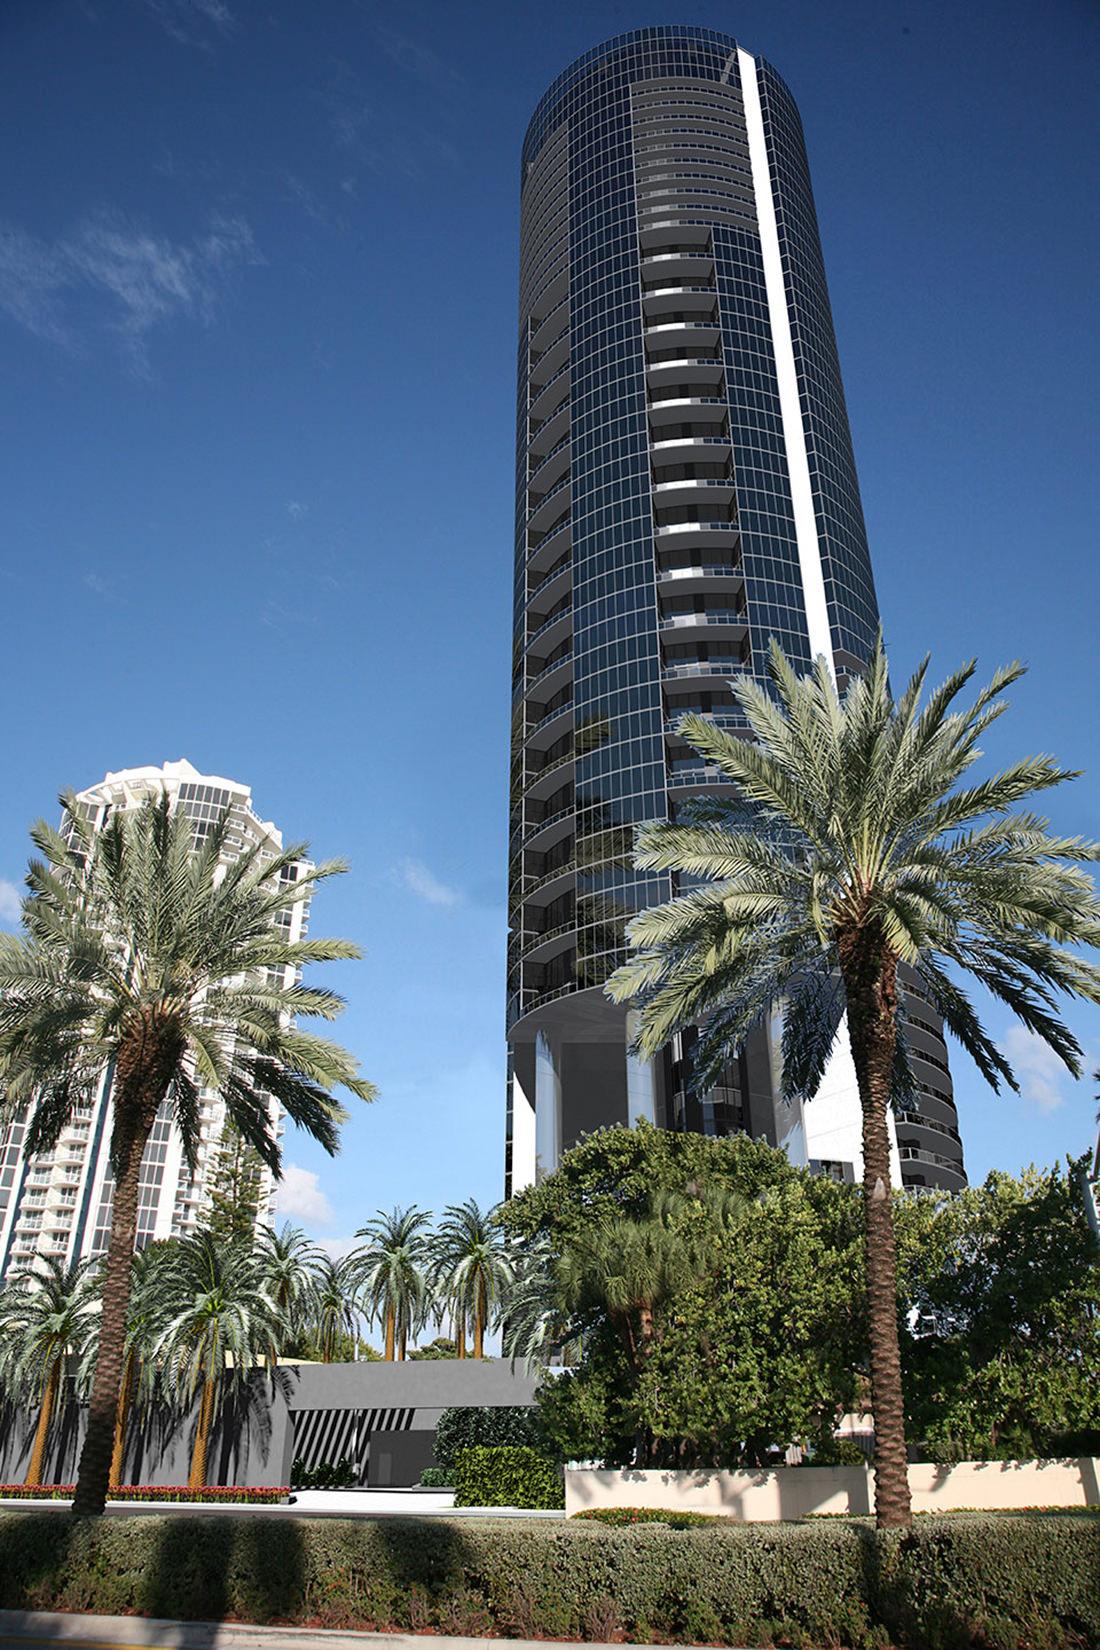 porsche-design-tower-miami-6